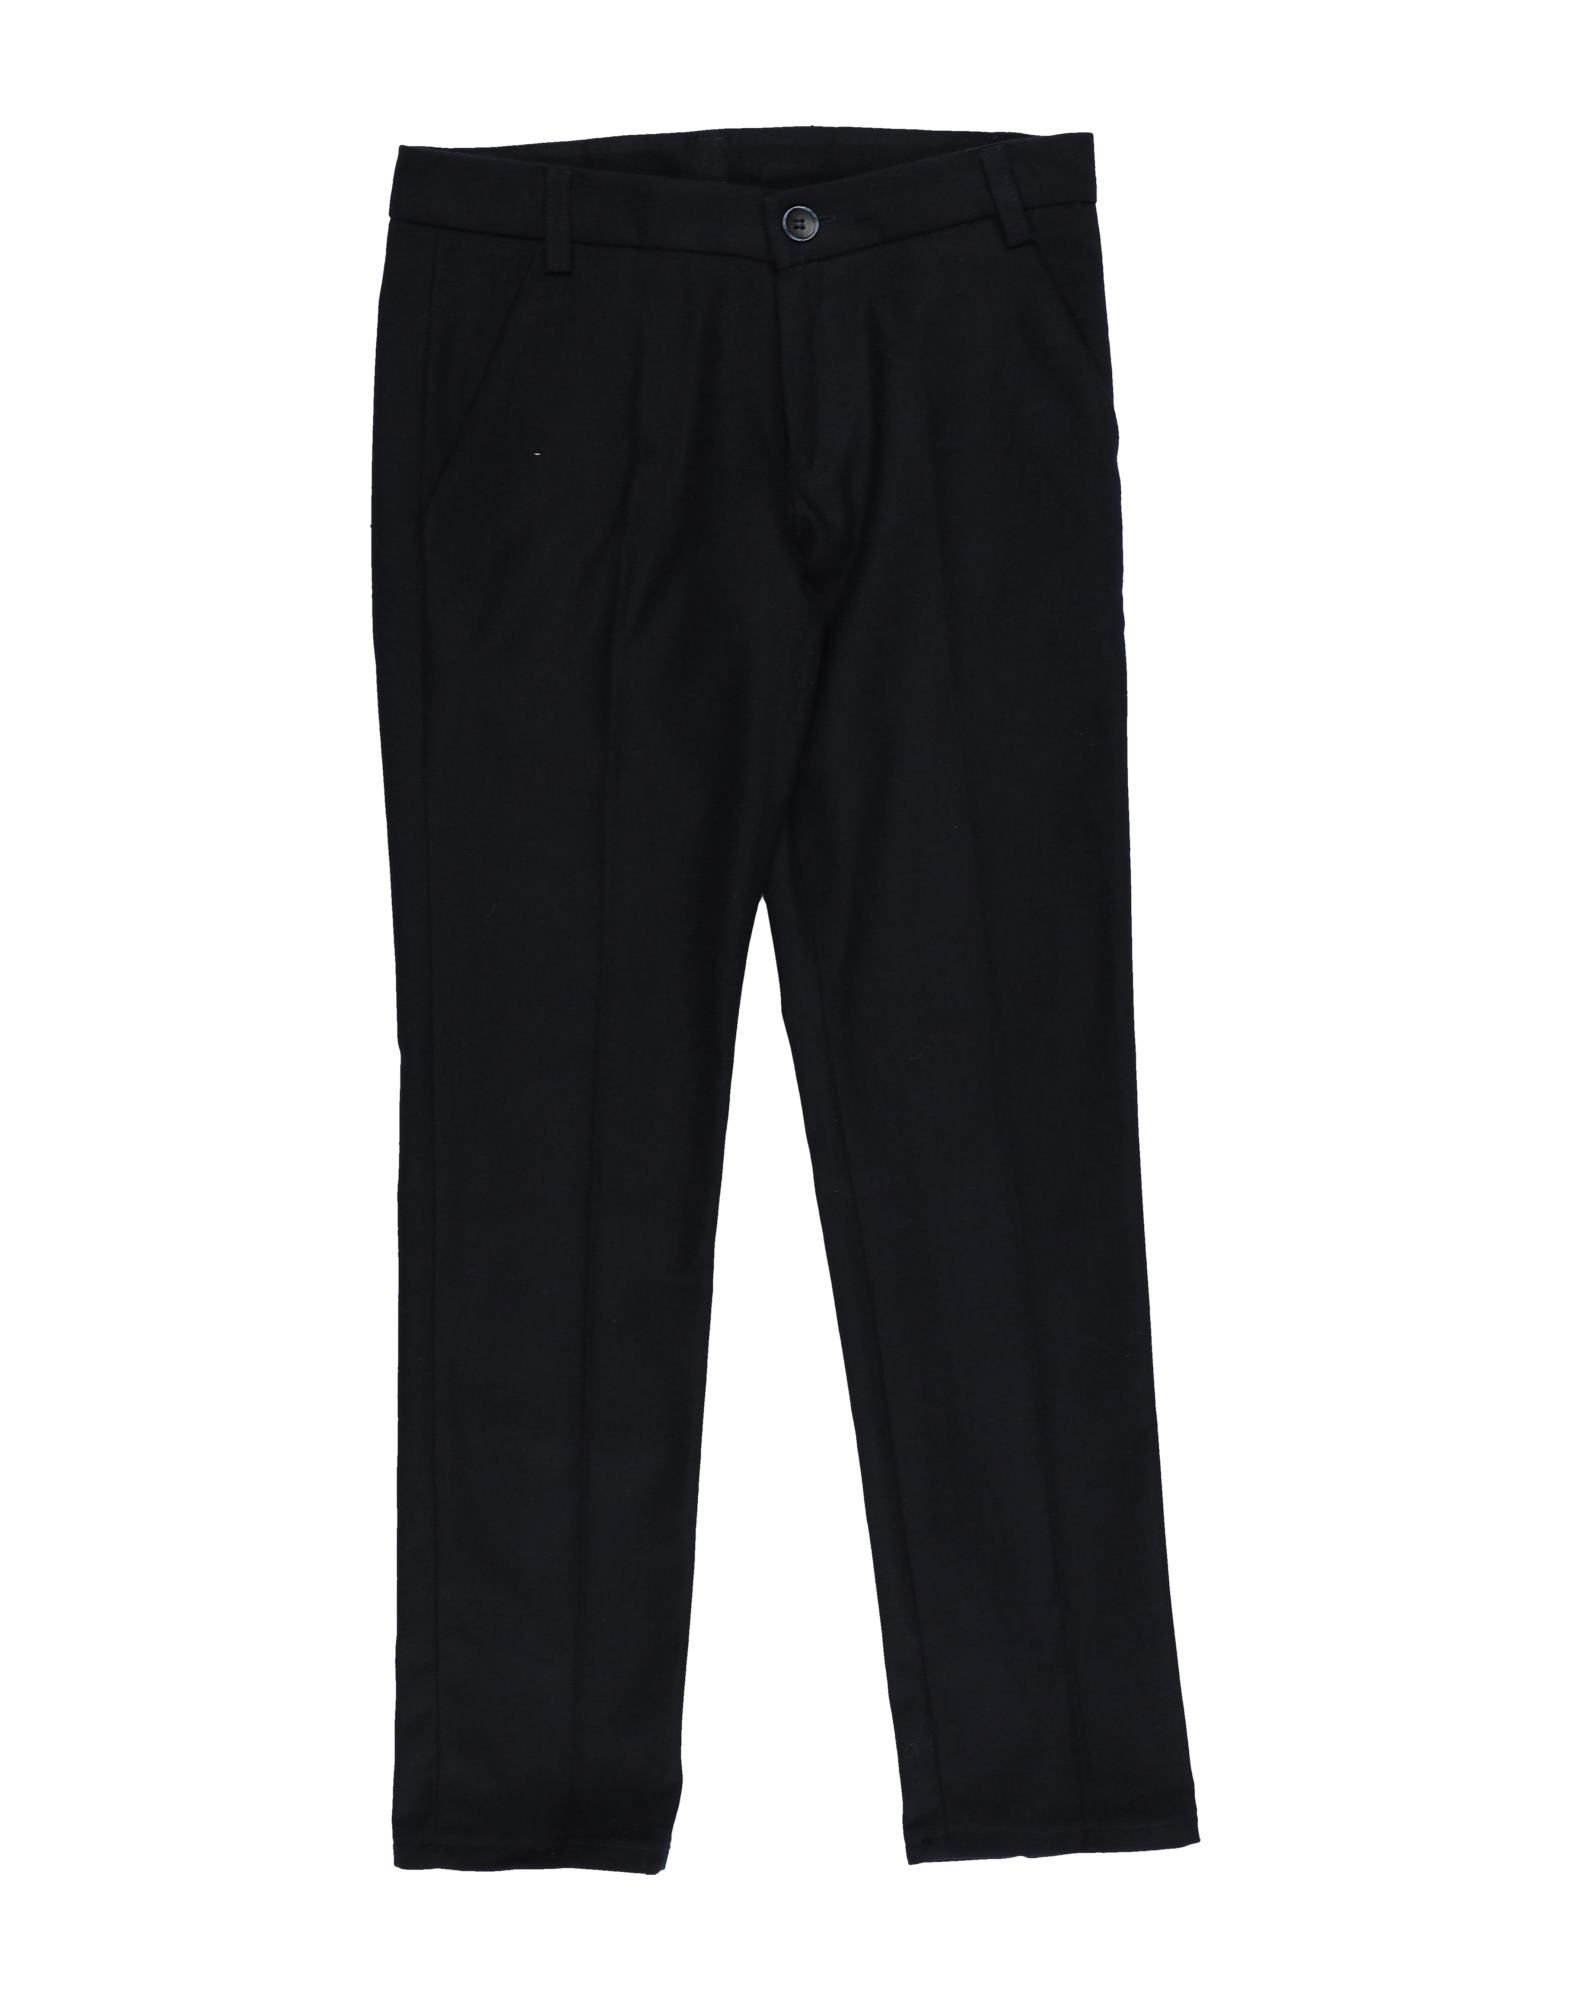 Manuell & Frank Kids' Casual Pants In Black